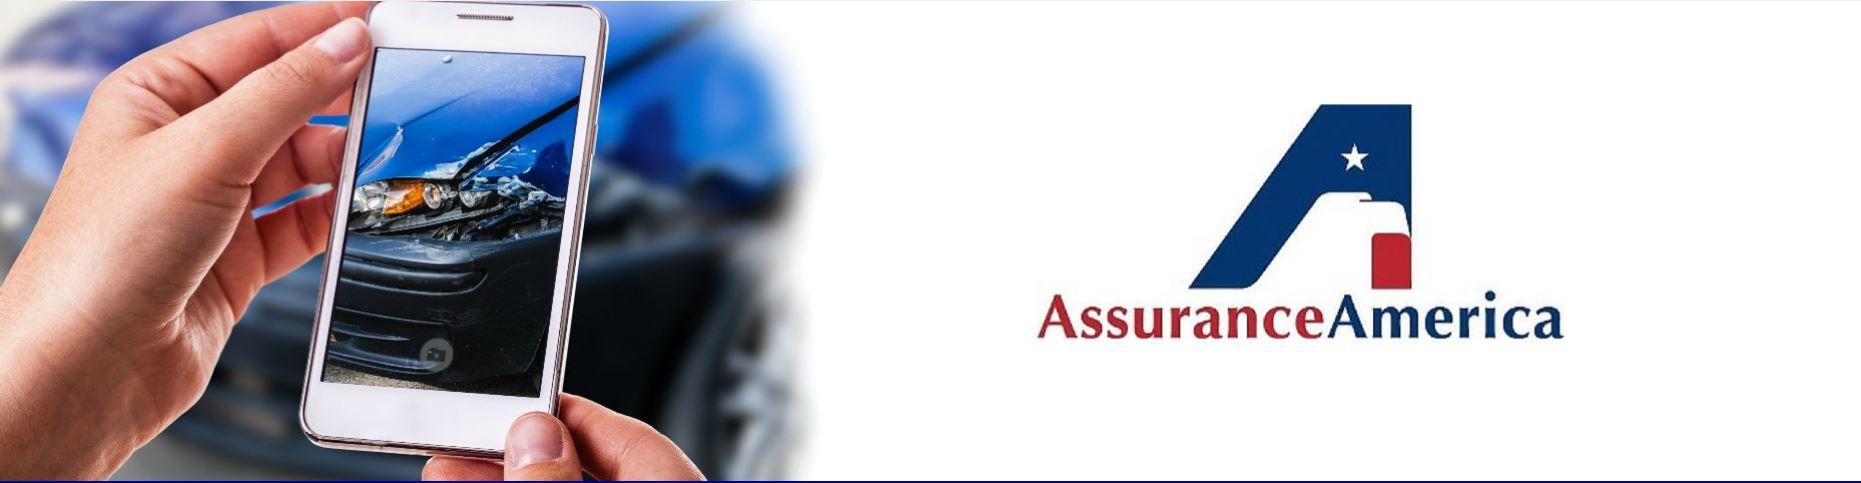 AssuranceAmerica